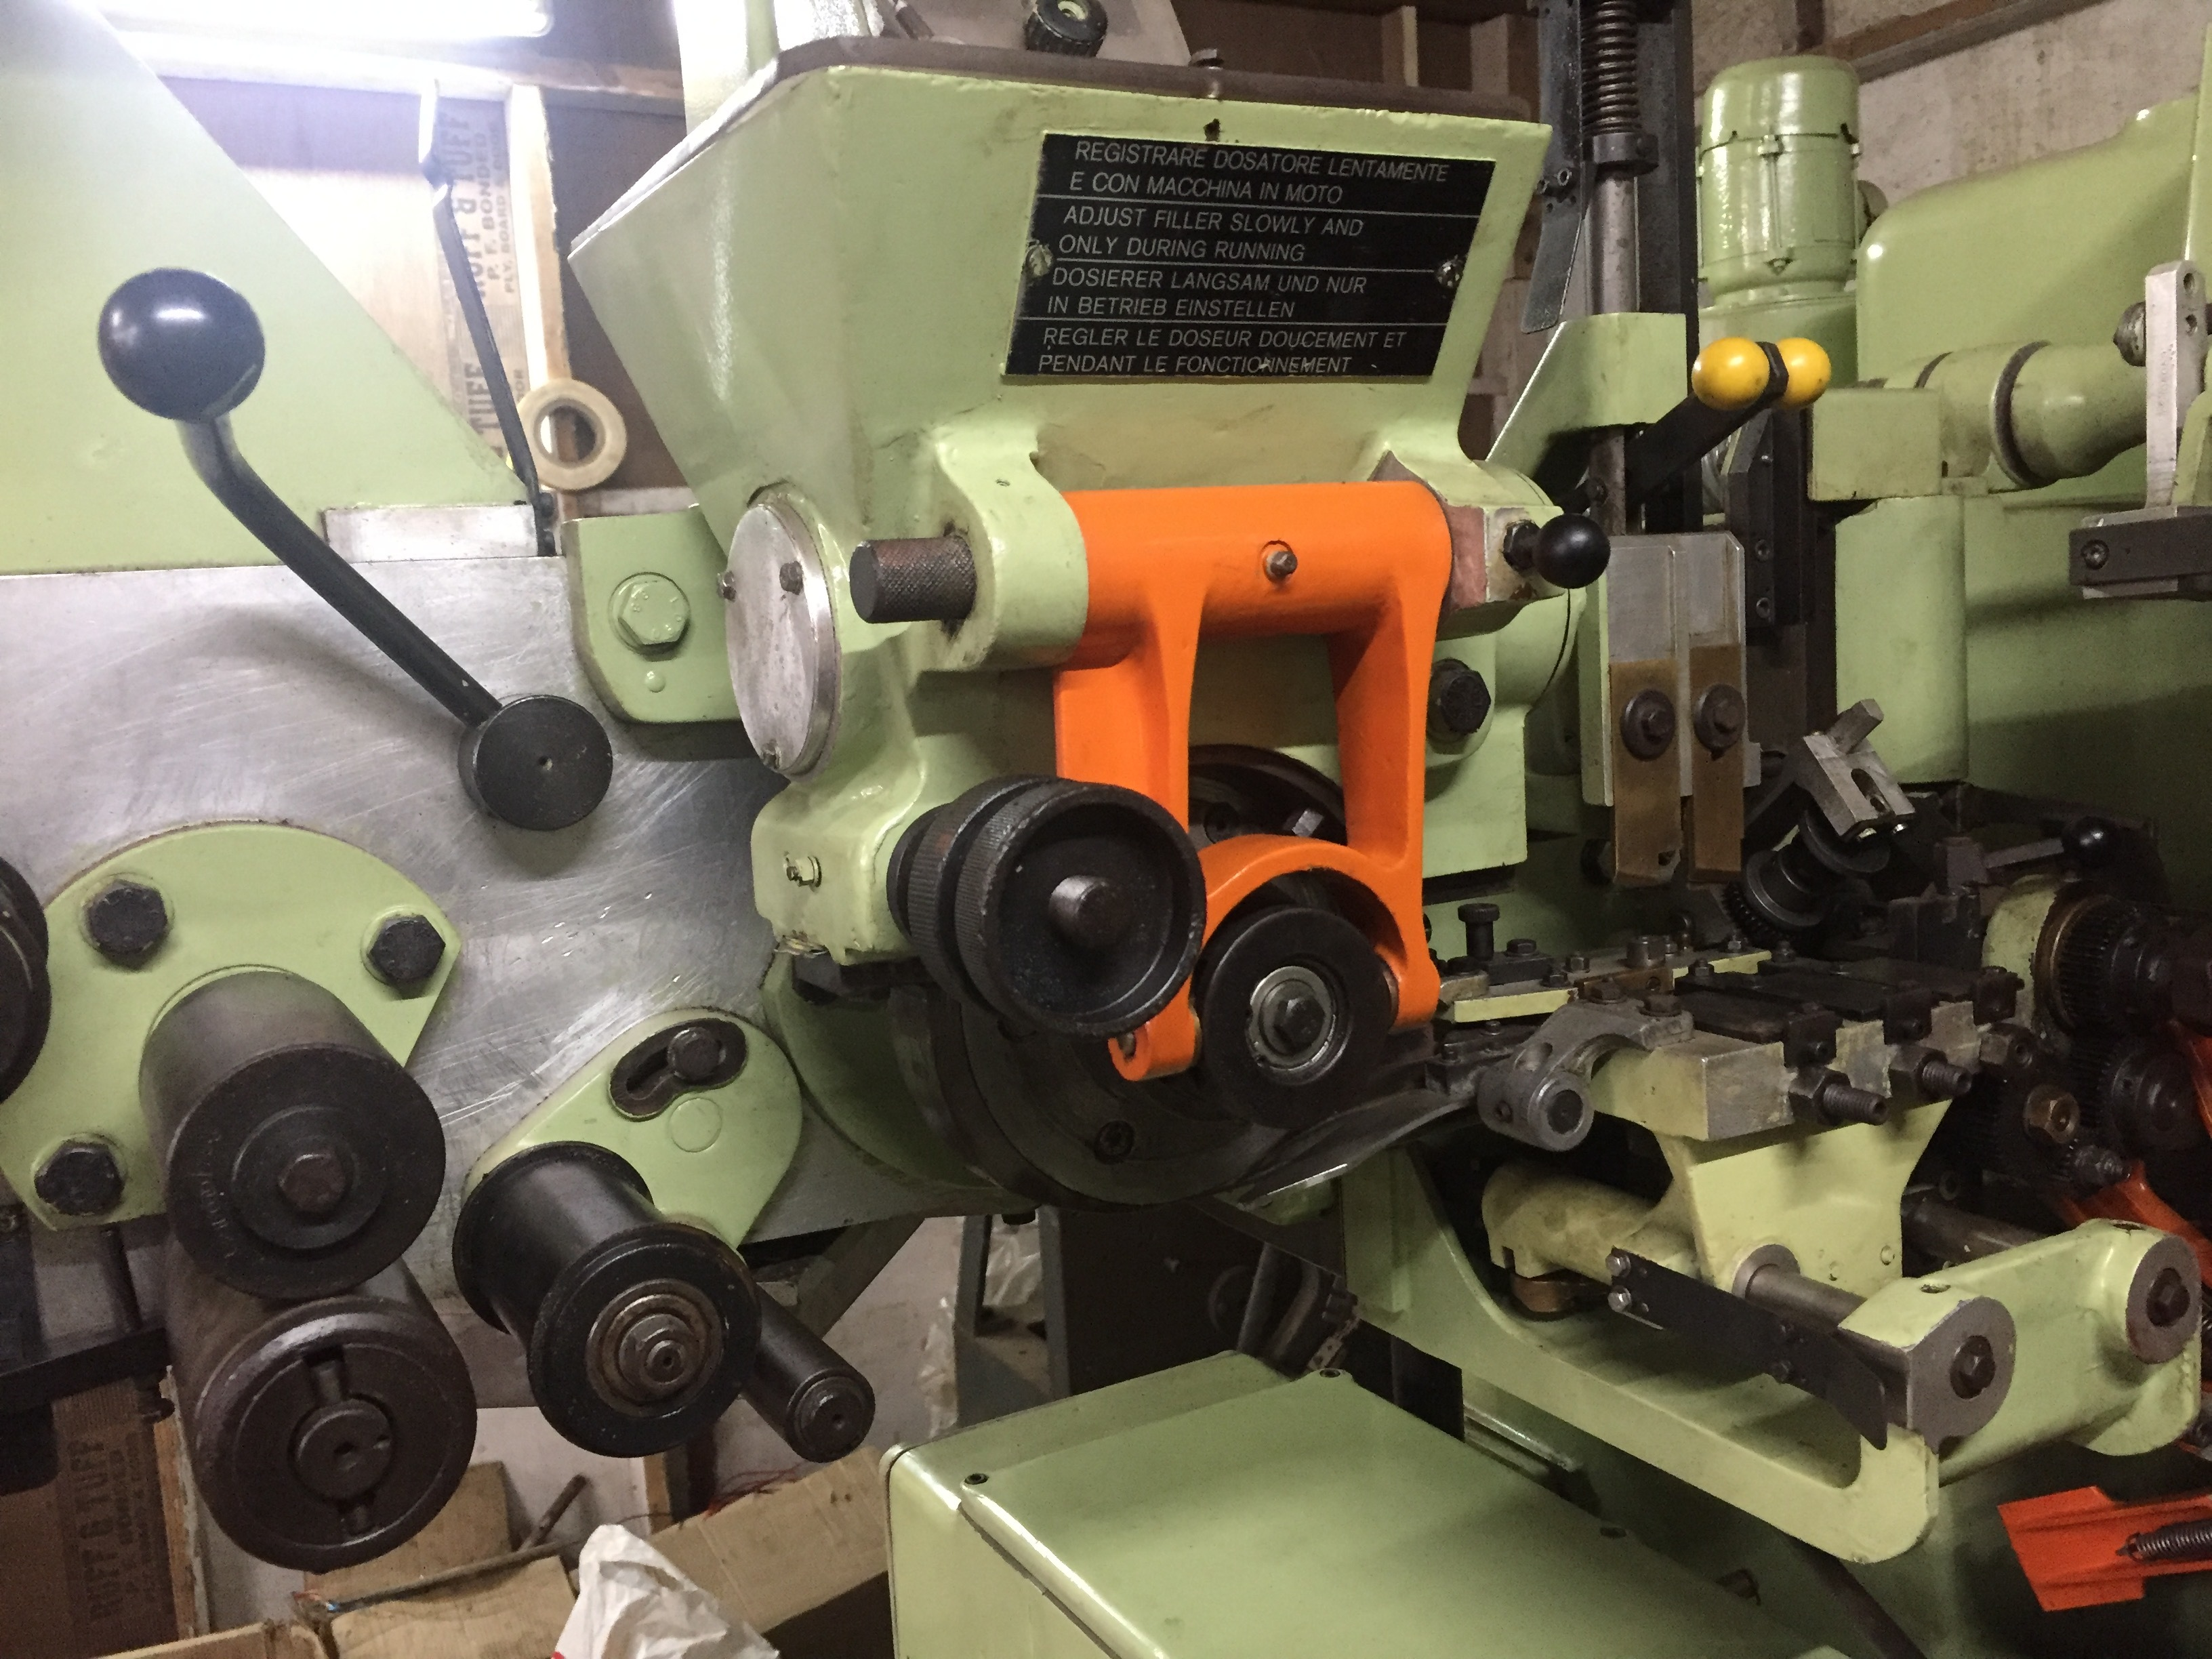 Refurbished IMA C21 Heated Outer Envelope Machine